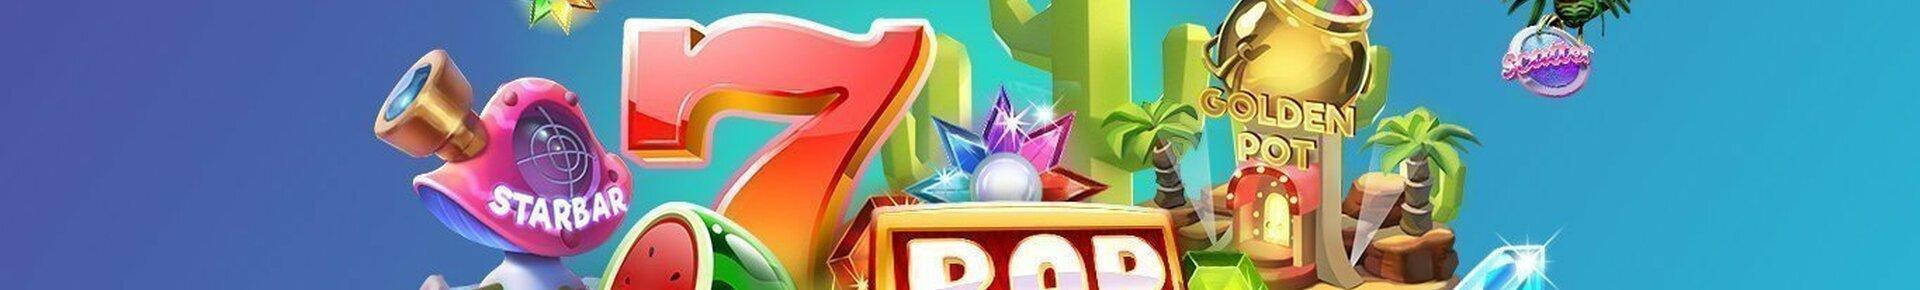 Casino Joy casino review UK